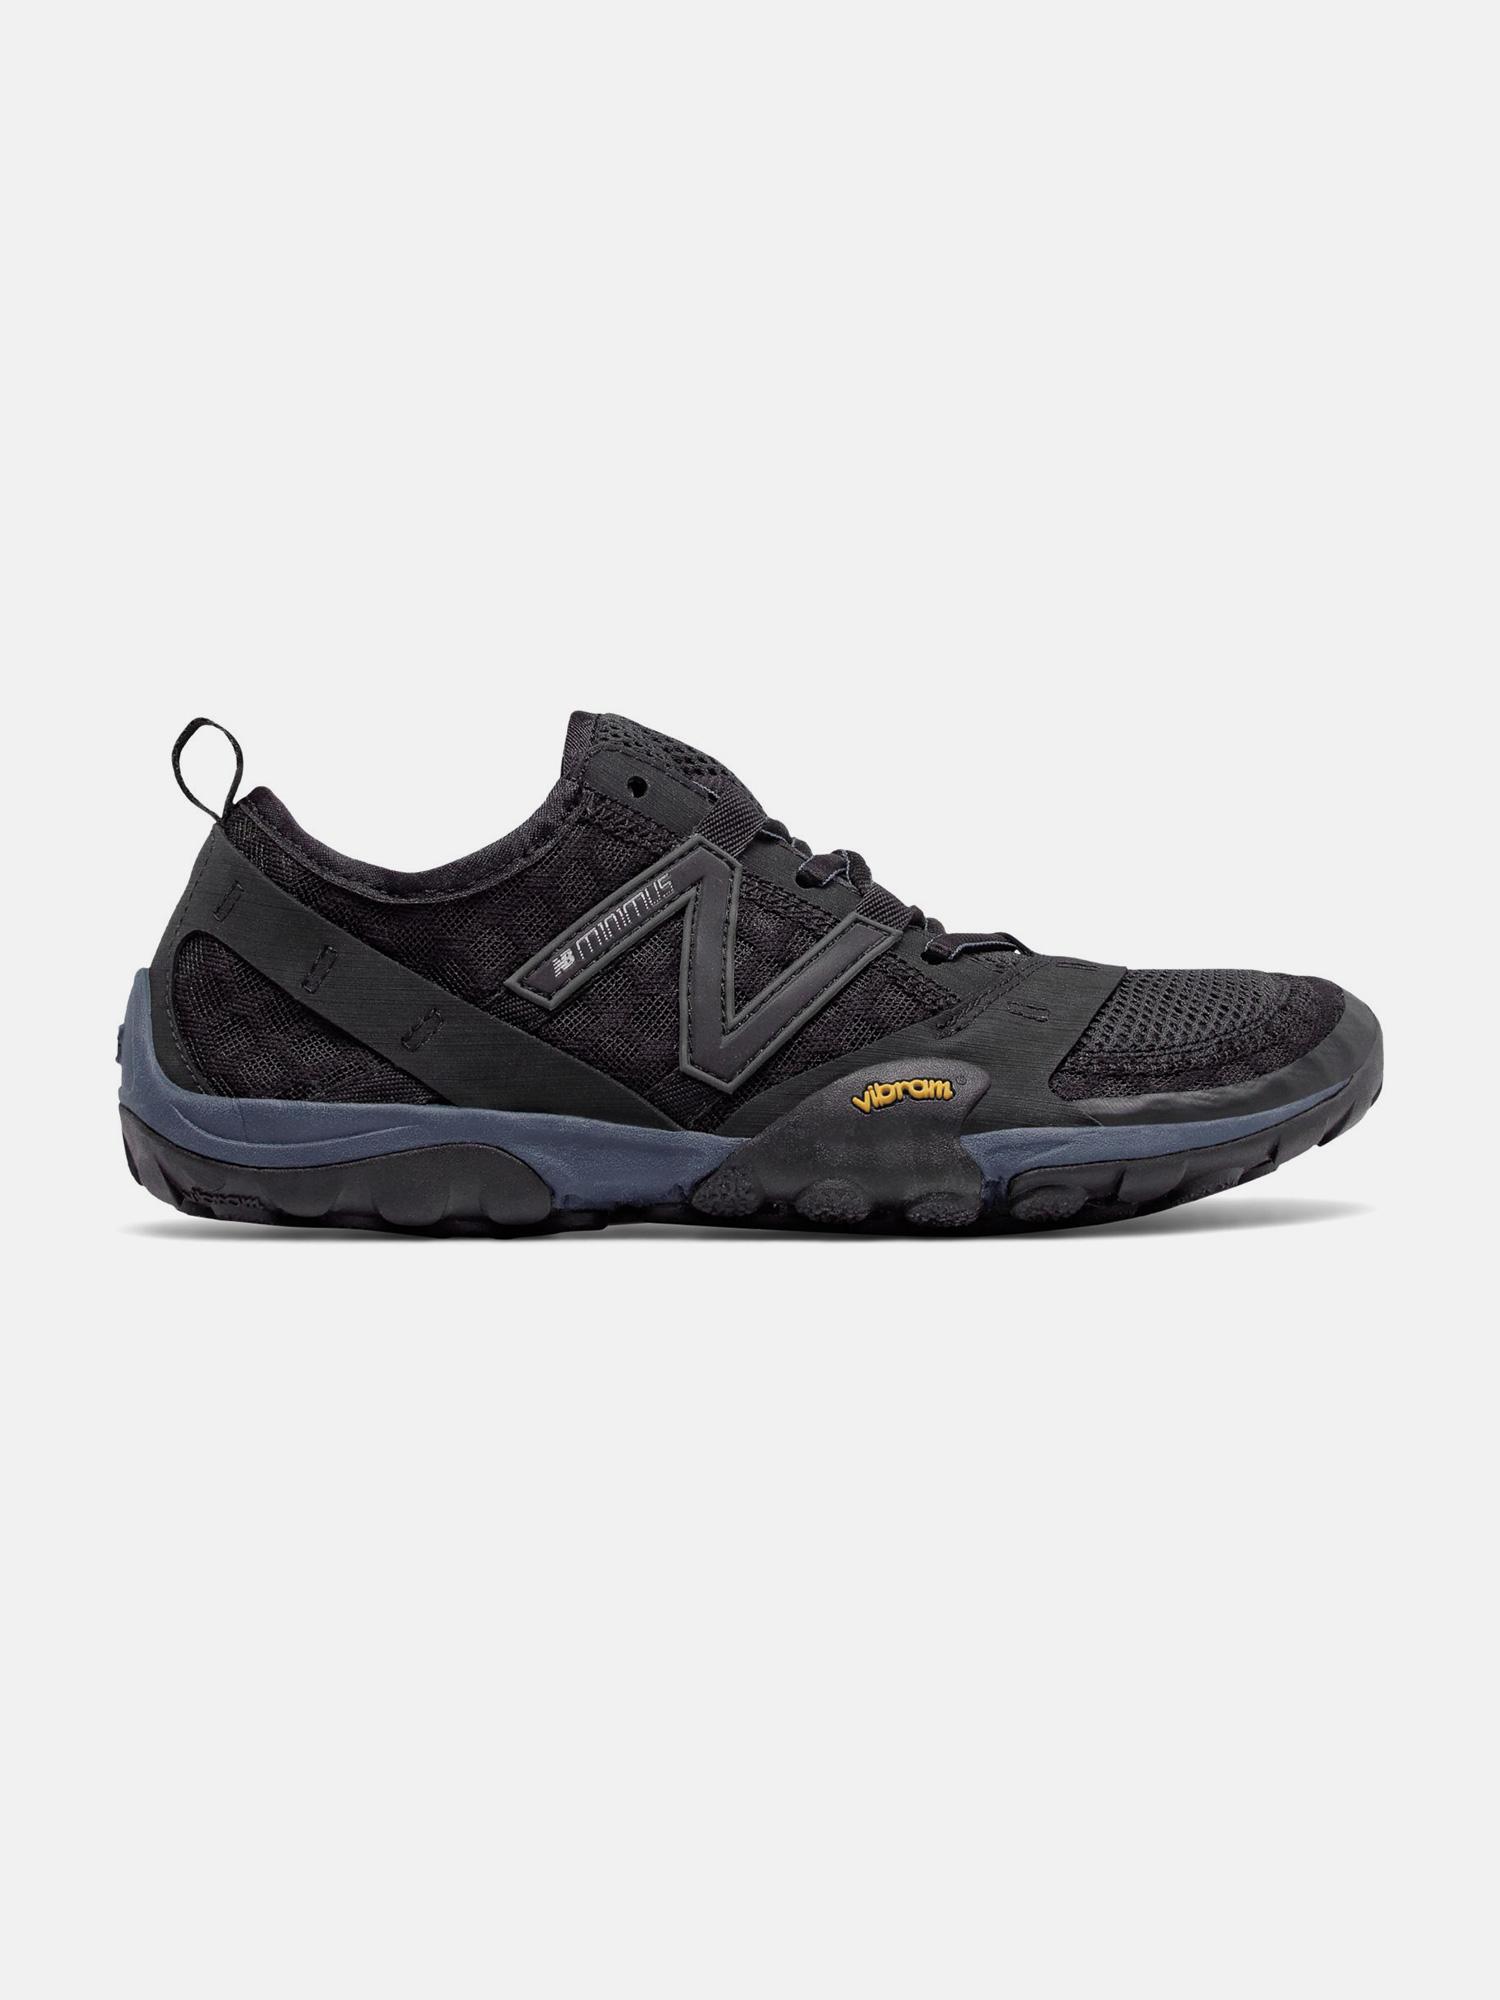 New Balance Trail Runners - $114.99